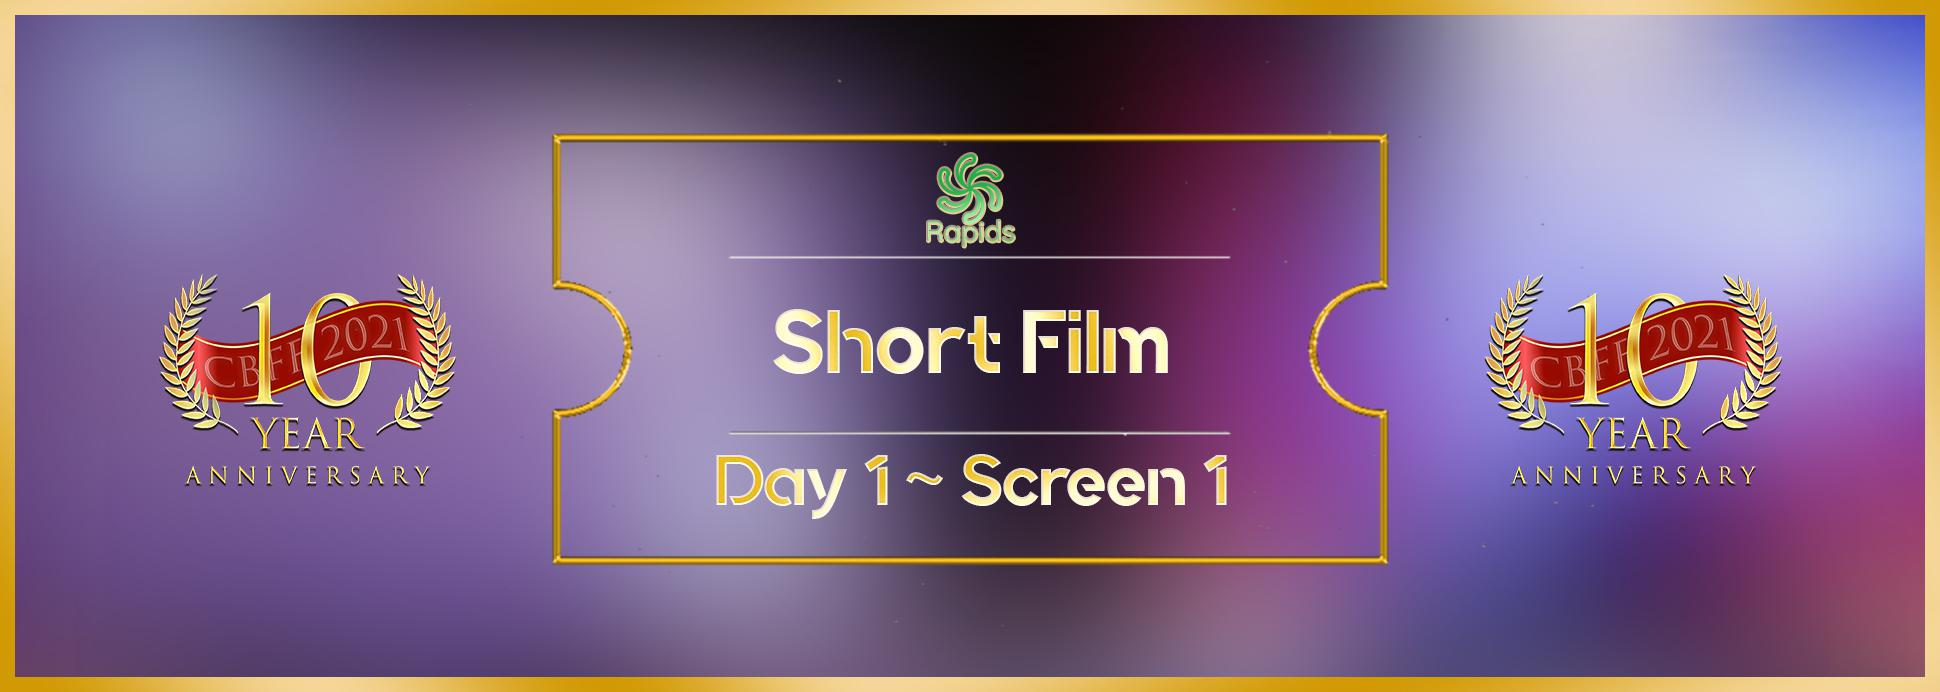 Day 1, Screen 1: Short Film